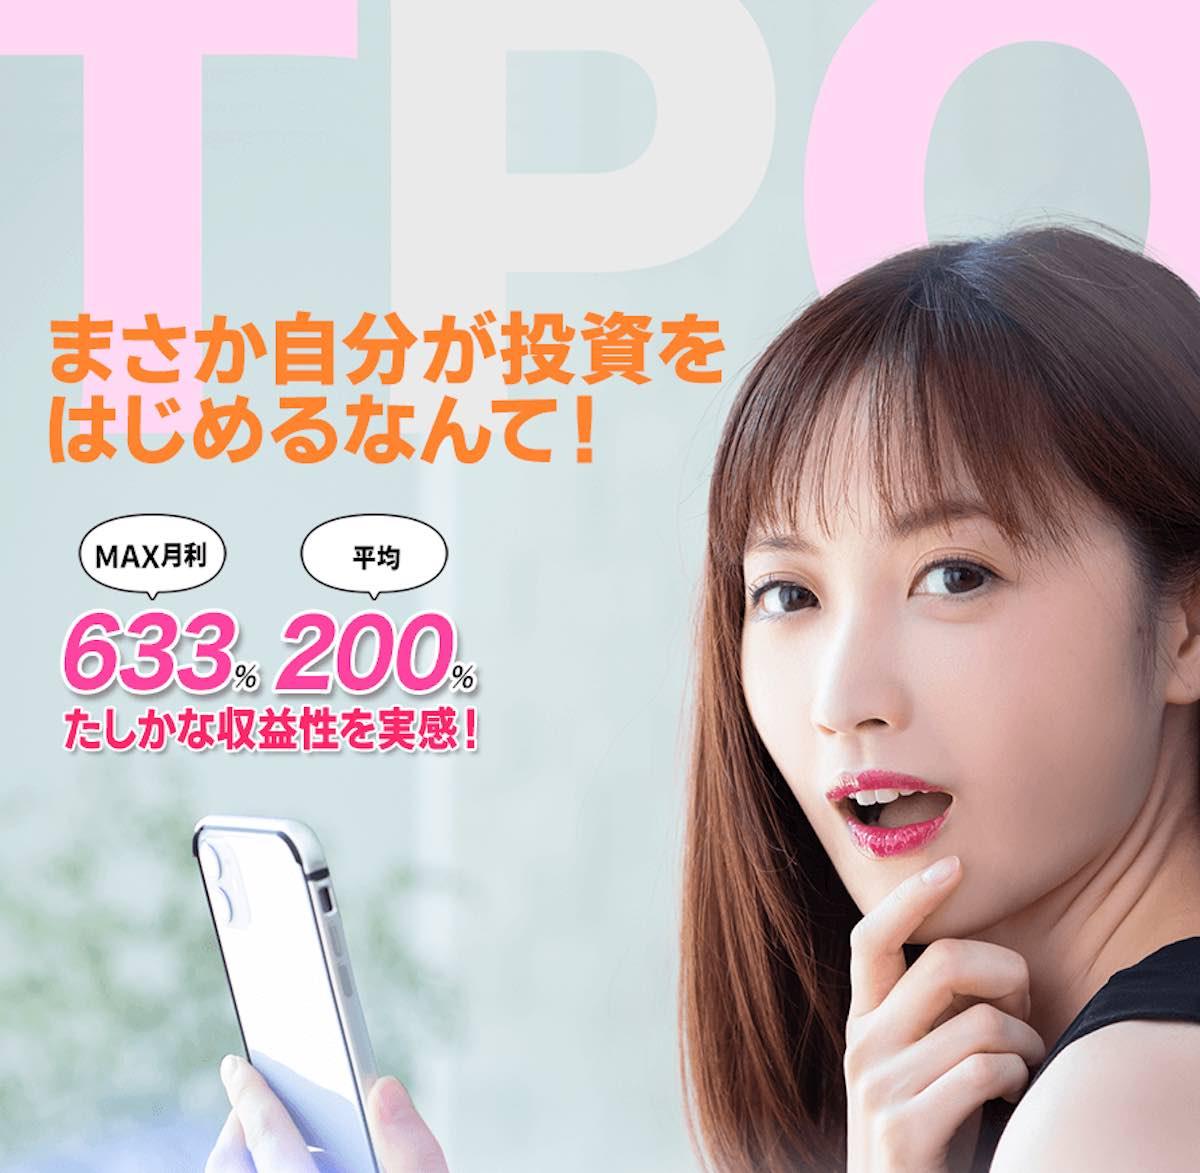 【TPO】資産形成アプリは詐欺?株式会社SKSystemsの川島将司とは?怪しい5GAIの内容について口コミや評判検証